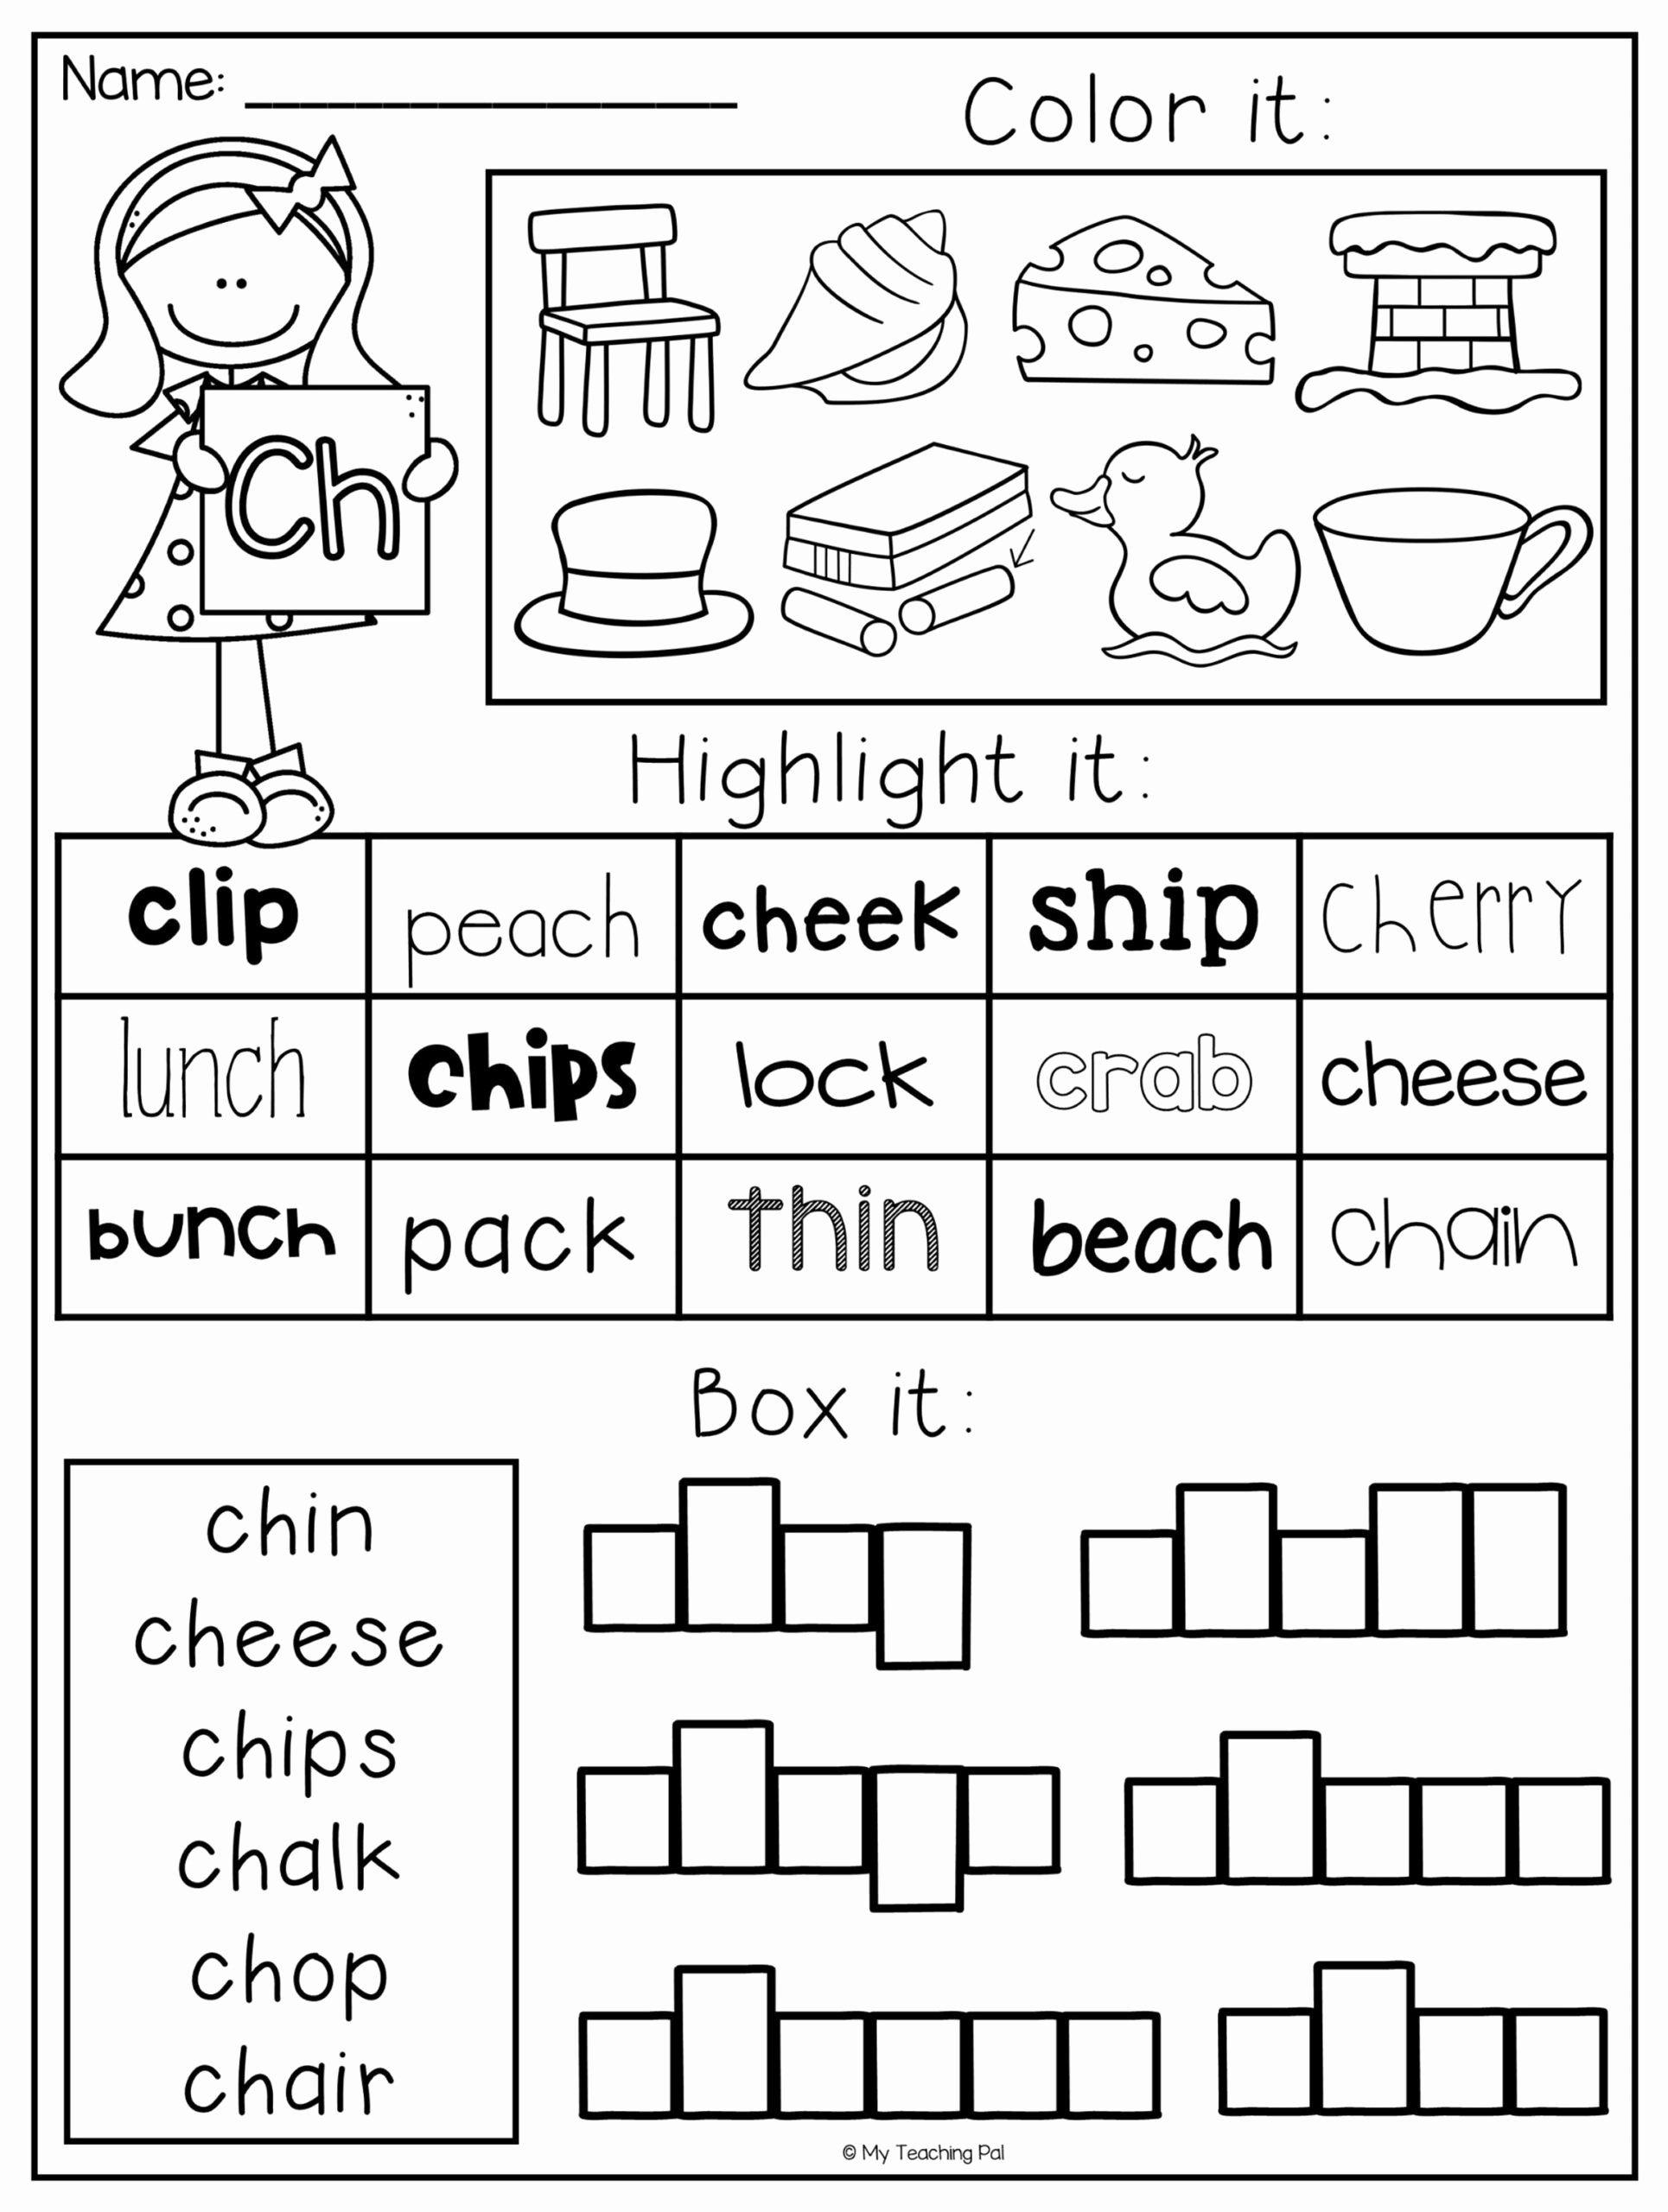 Ch Worksheets For Kindergarten Unique Digraph Worksheet Packet Ch Th Wh Ph Digraphs Worksheets Phonics Worksheets Digraphs Worksheets Phonics Worksheets Free Th digraph worksheets first grade